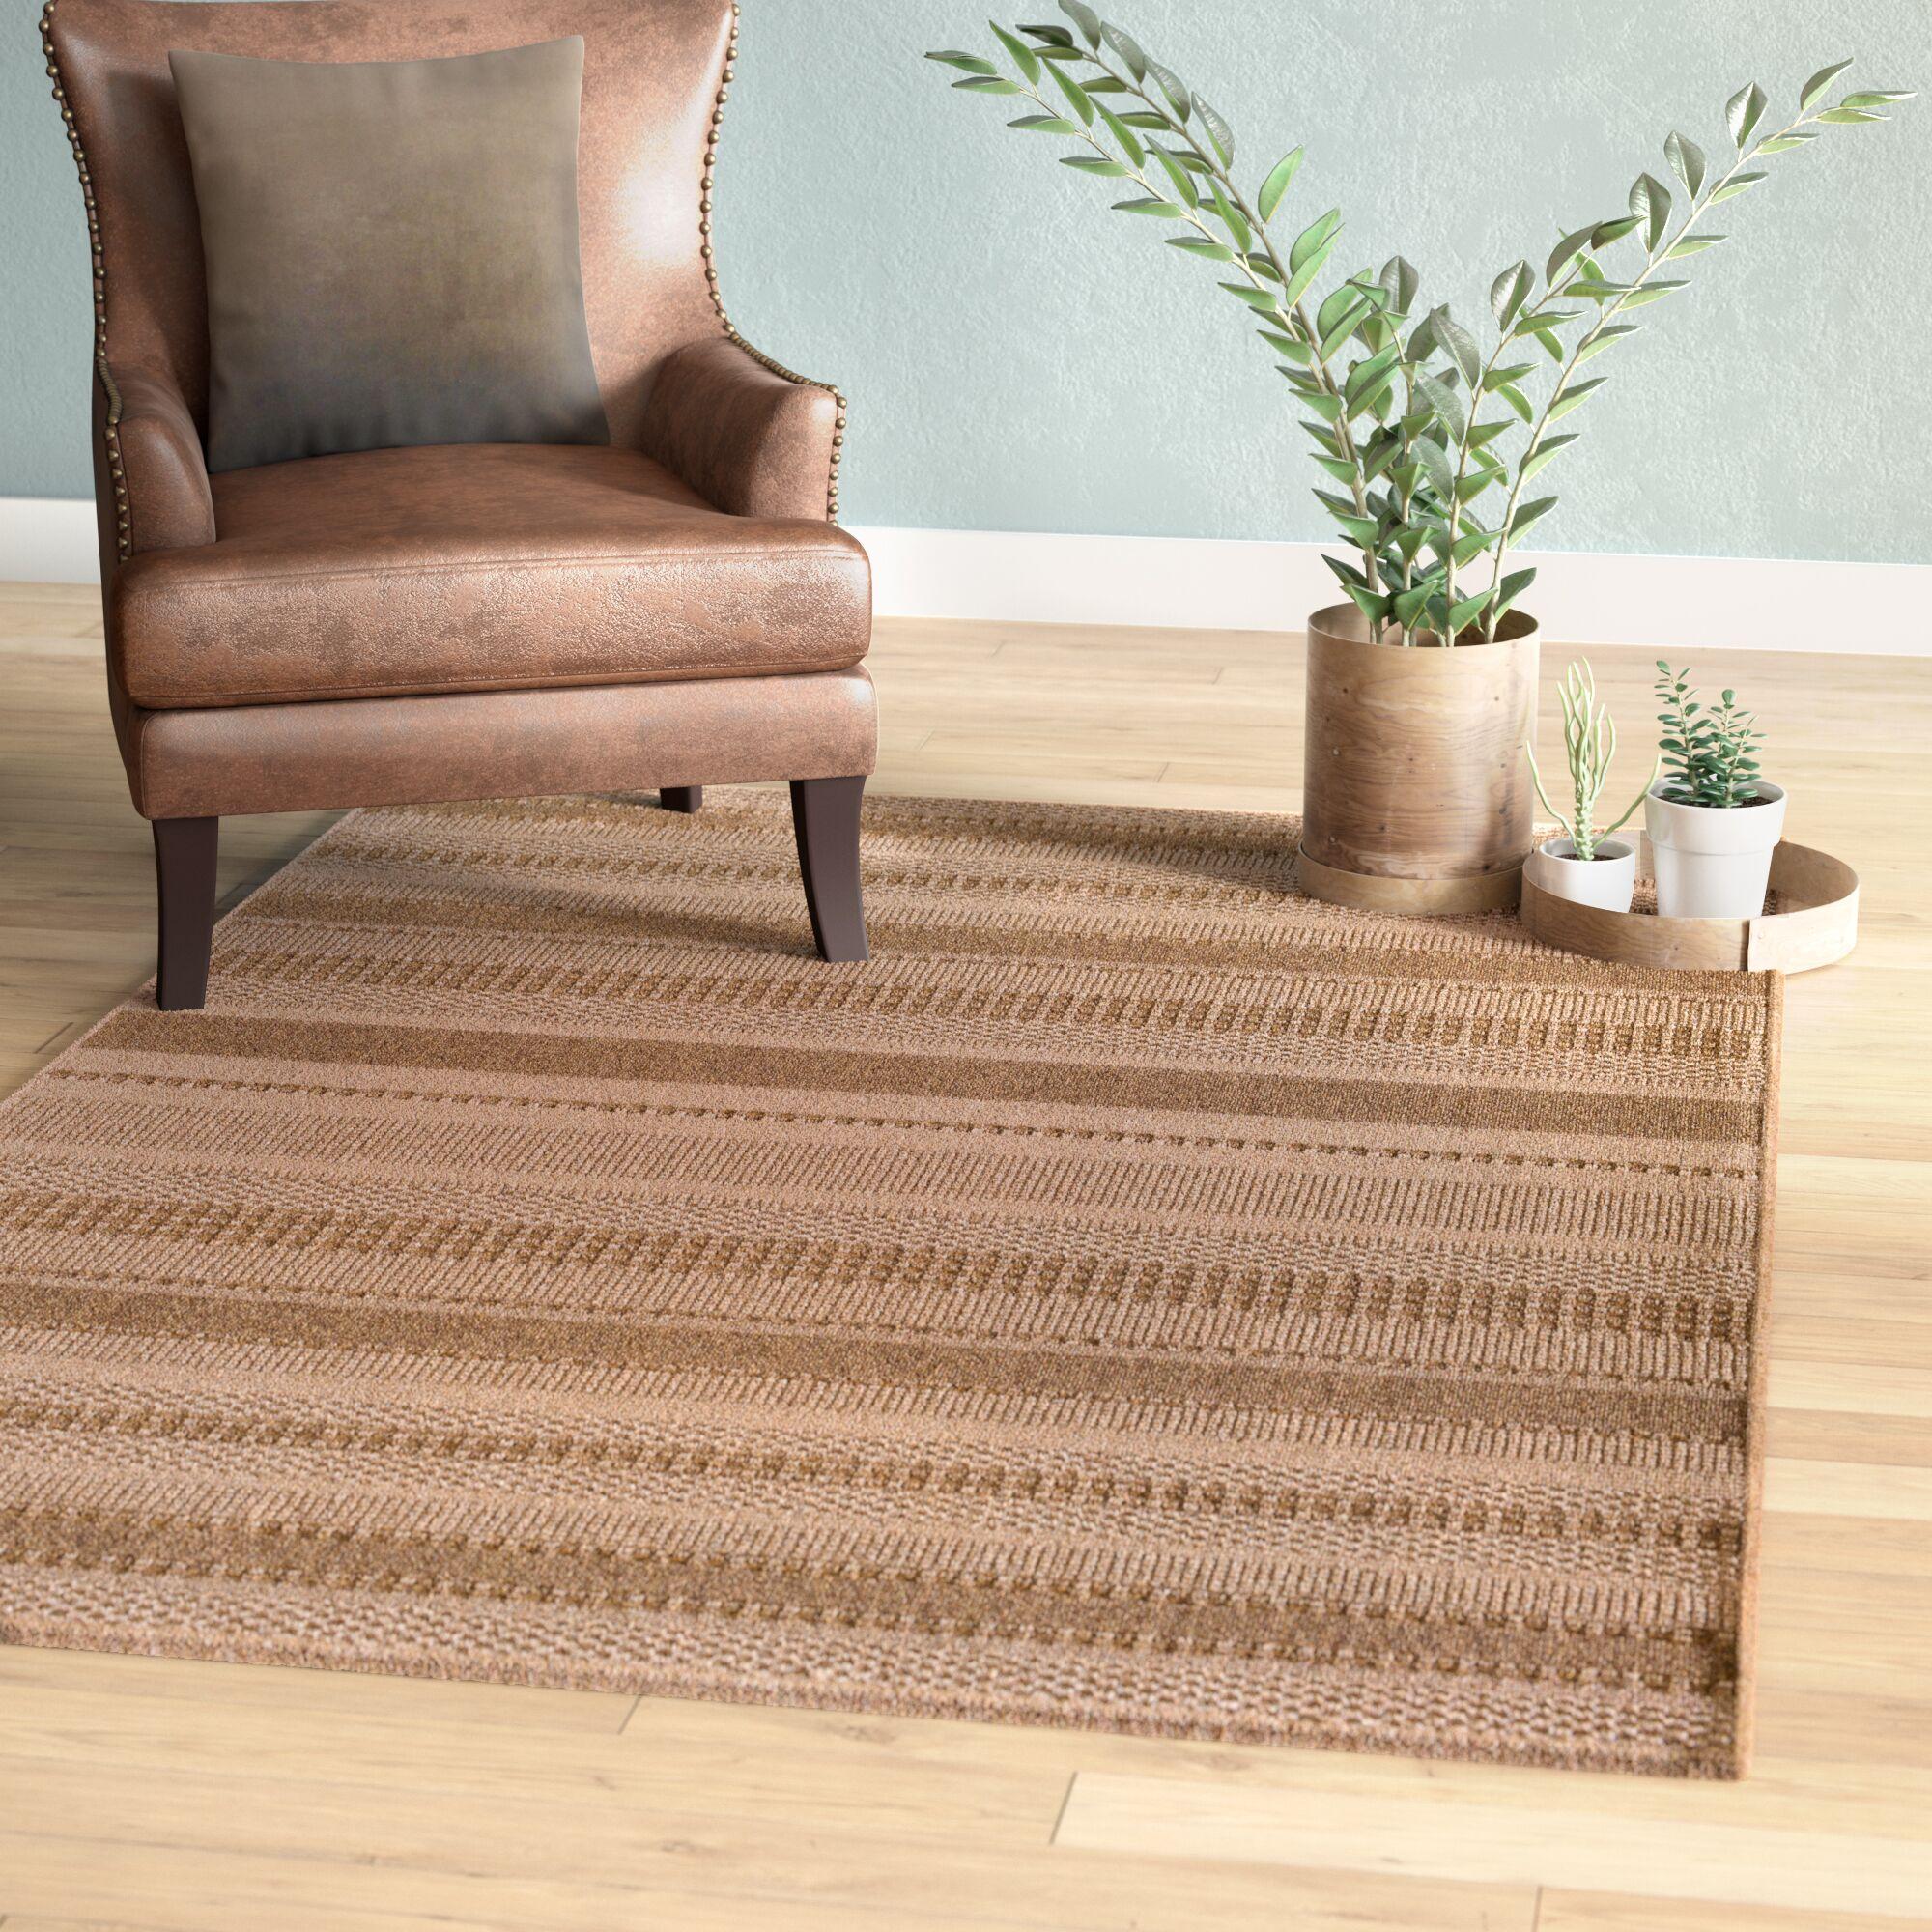 Annica Large Stripe Beige Indoor/Outdoor Area Rug Rug Size: 6'7